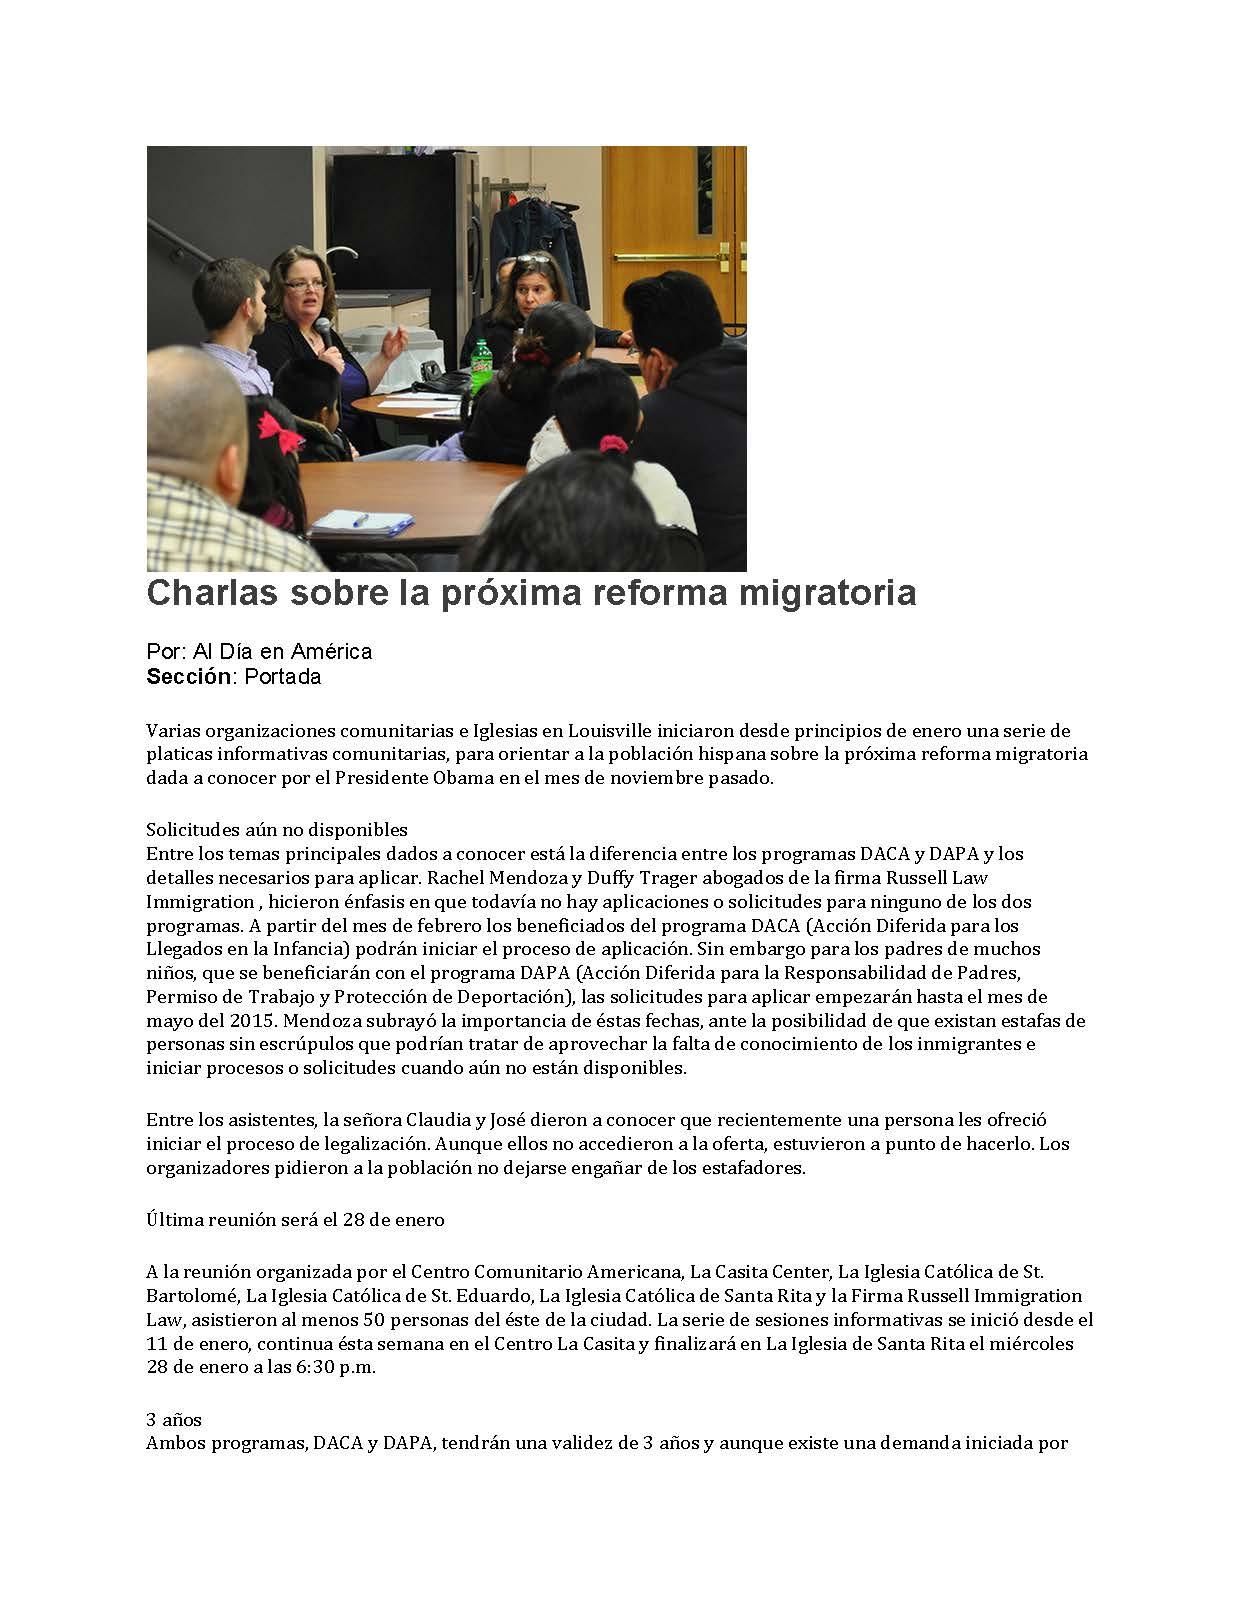 Charlas sobre la próxima reforma migratoria_Page_1.jpg